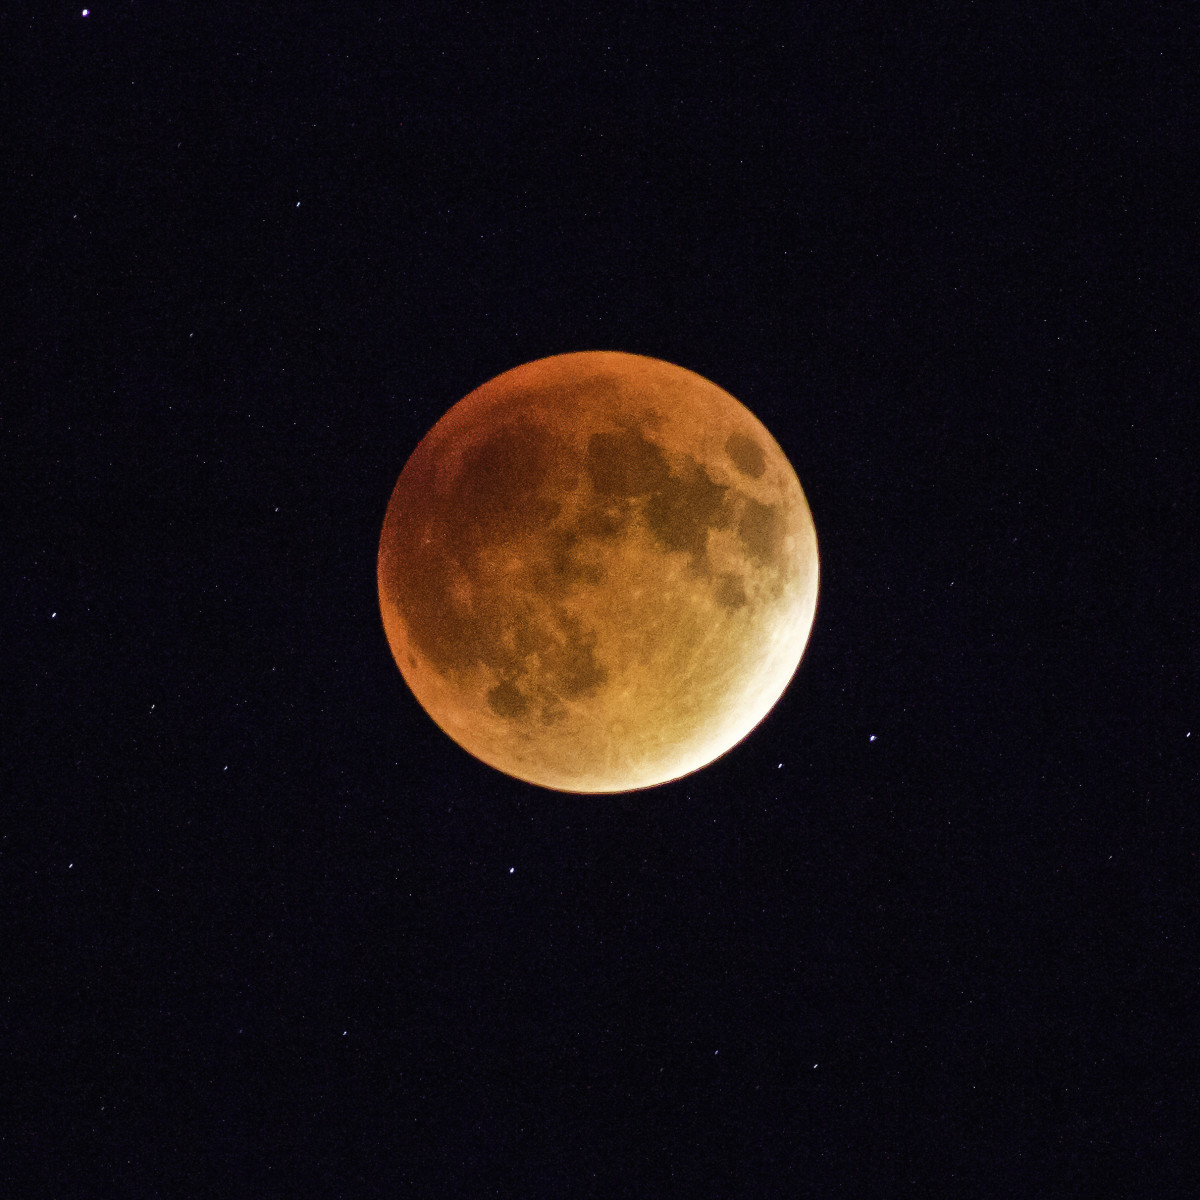 Eclipse, Blood Moon